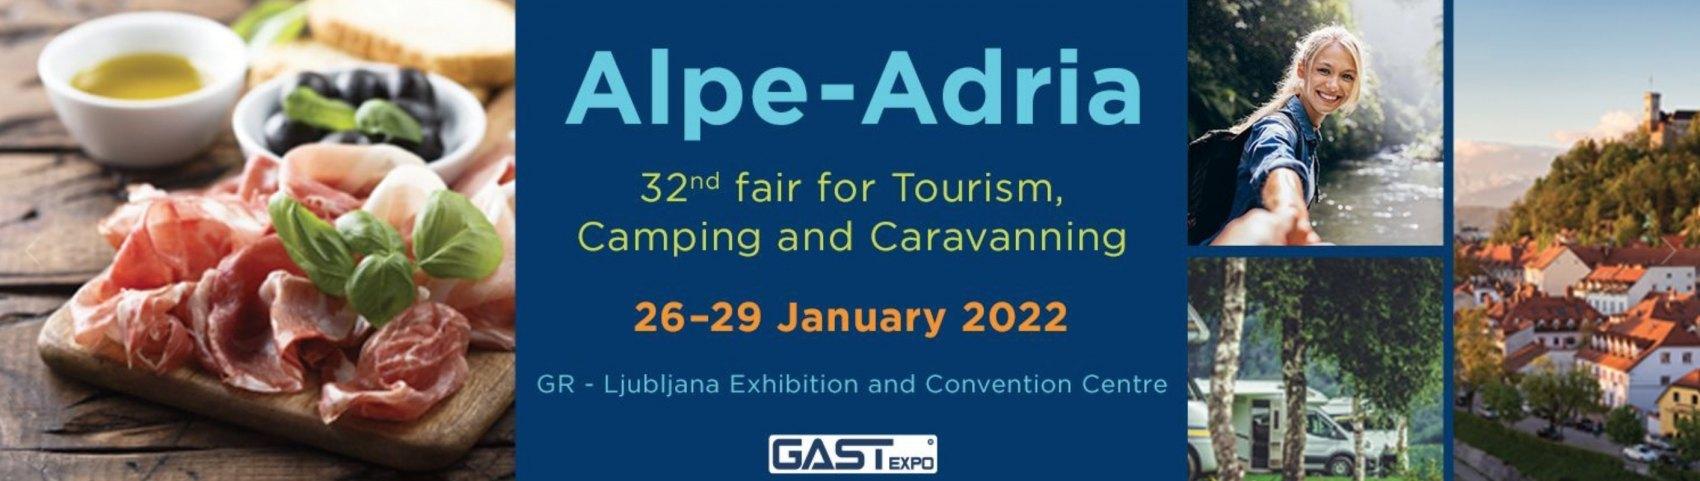 Alpe Adria Conference